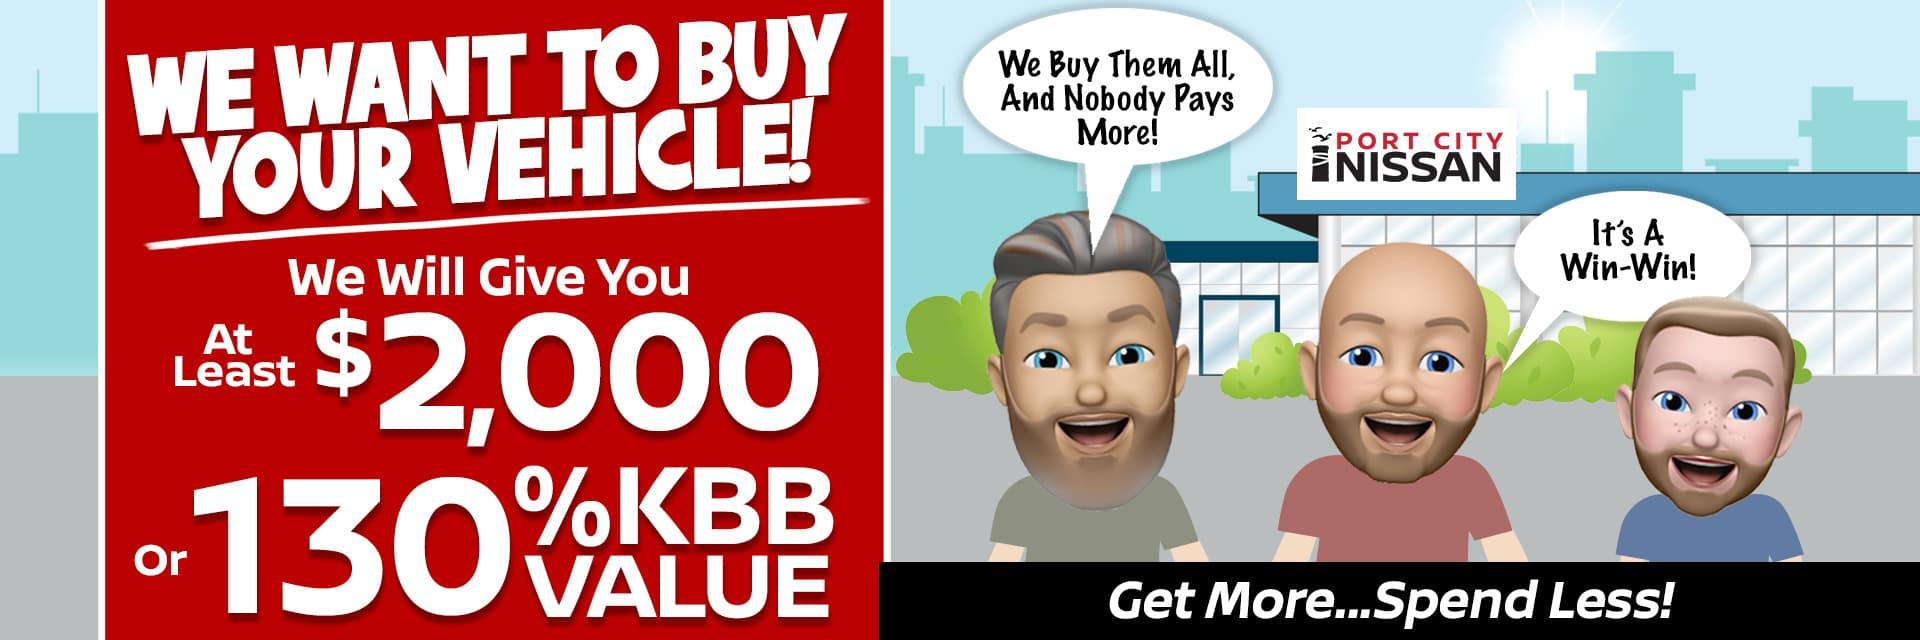 130% KBB Value Port City Nissan